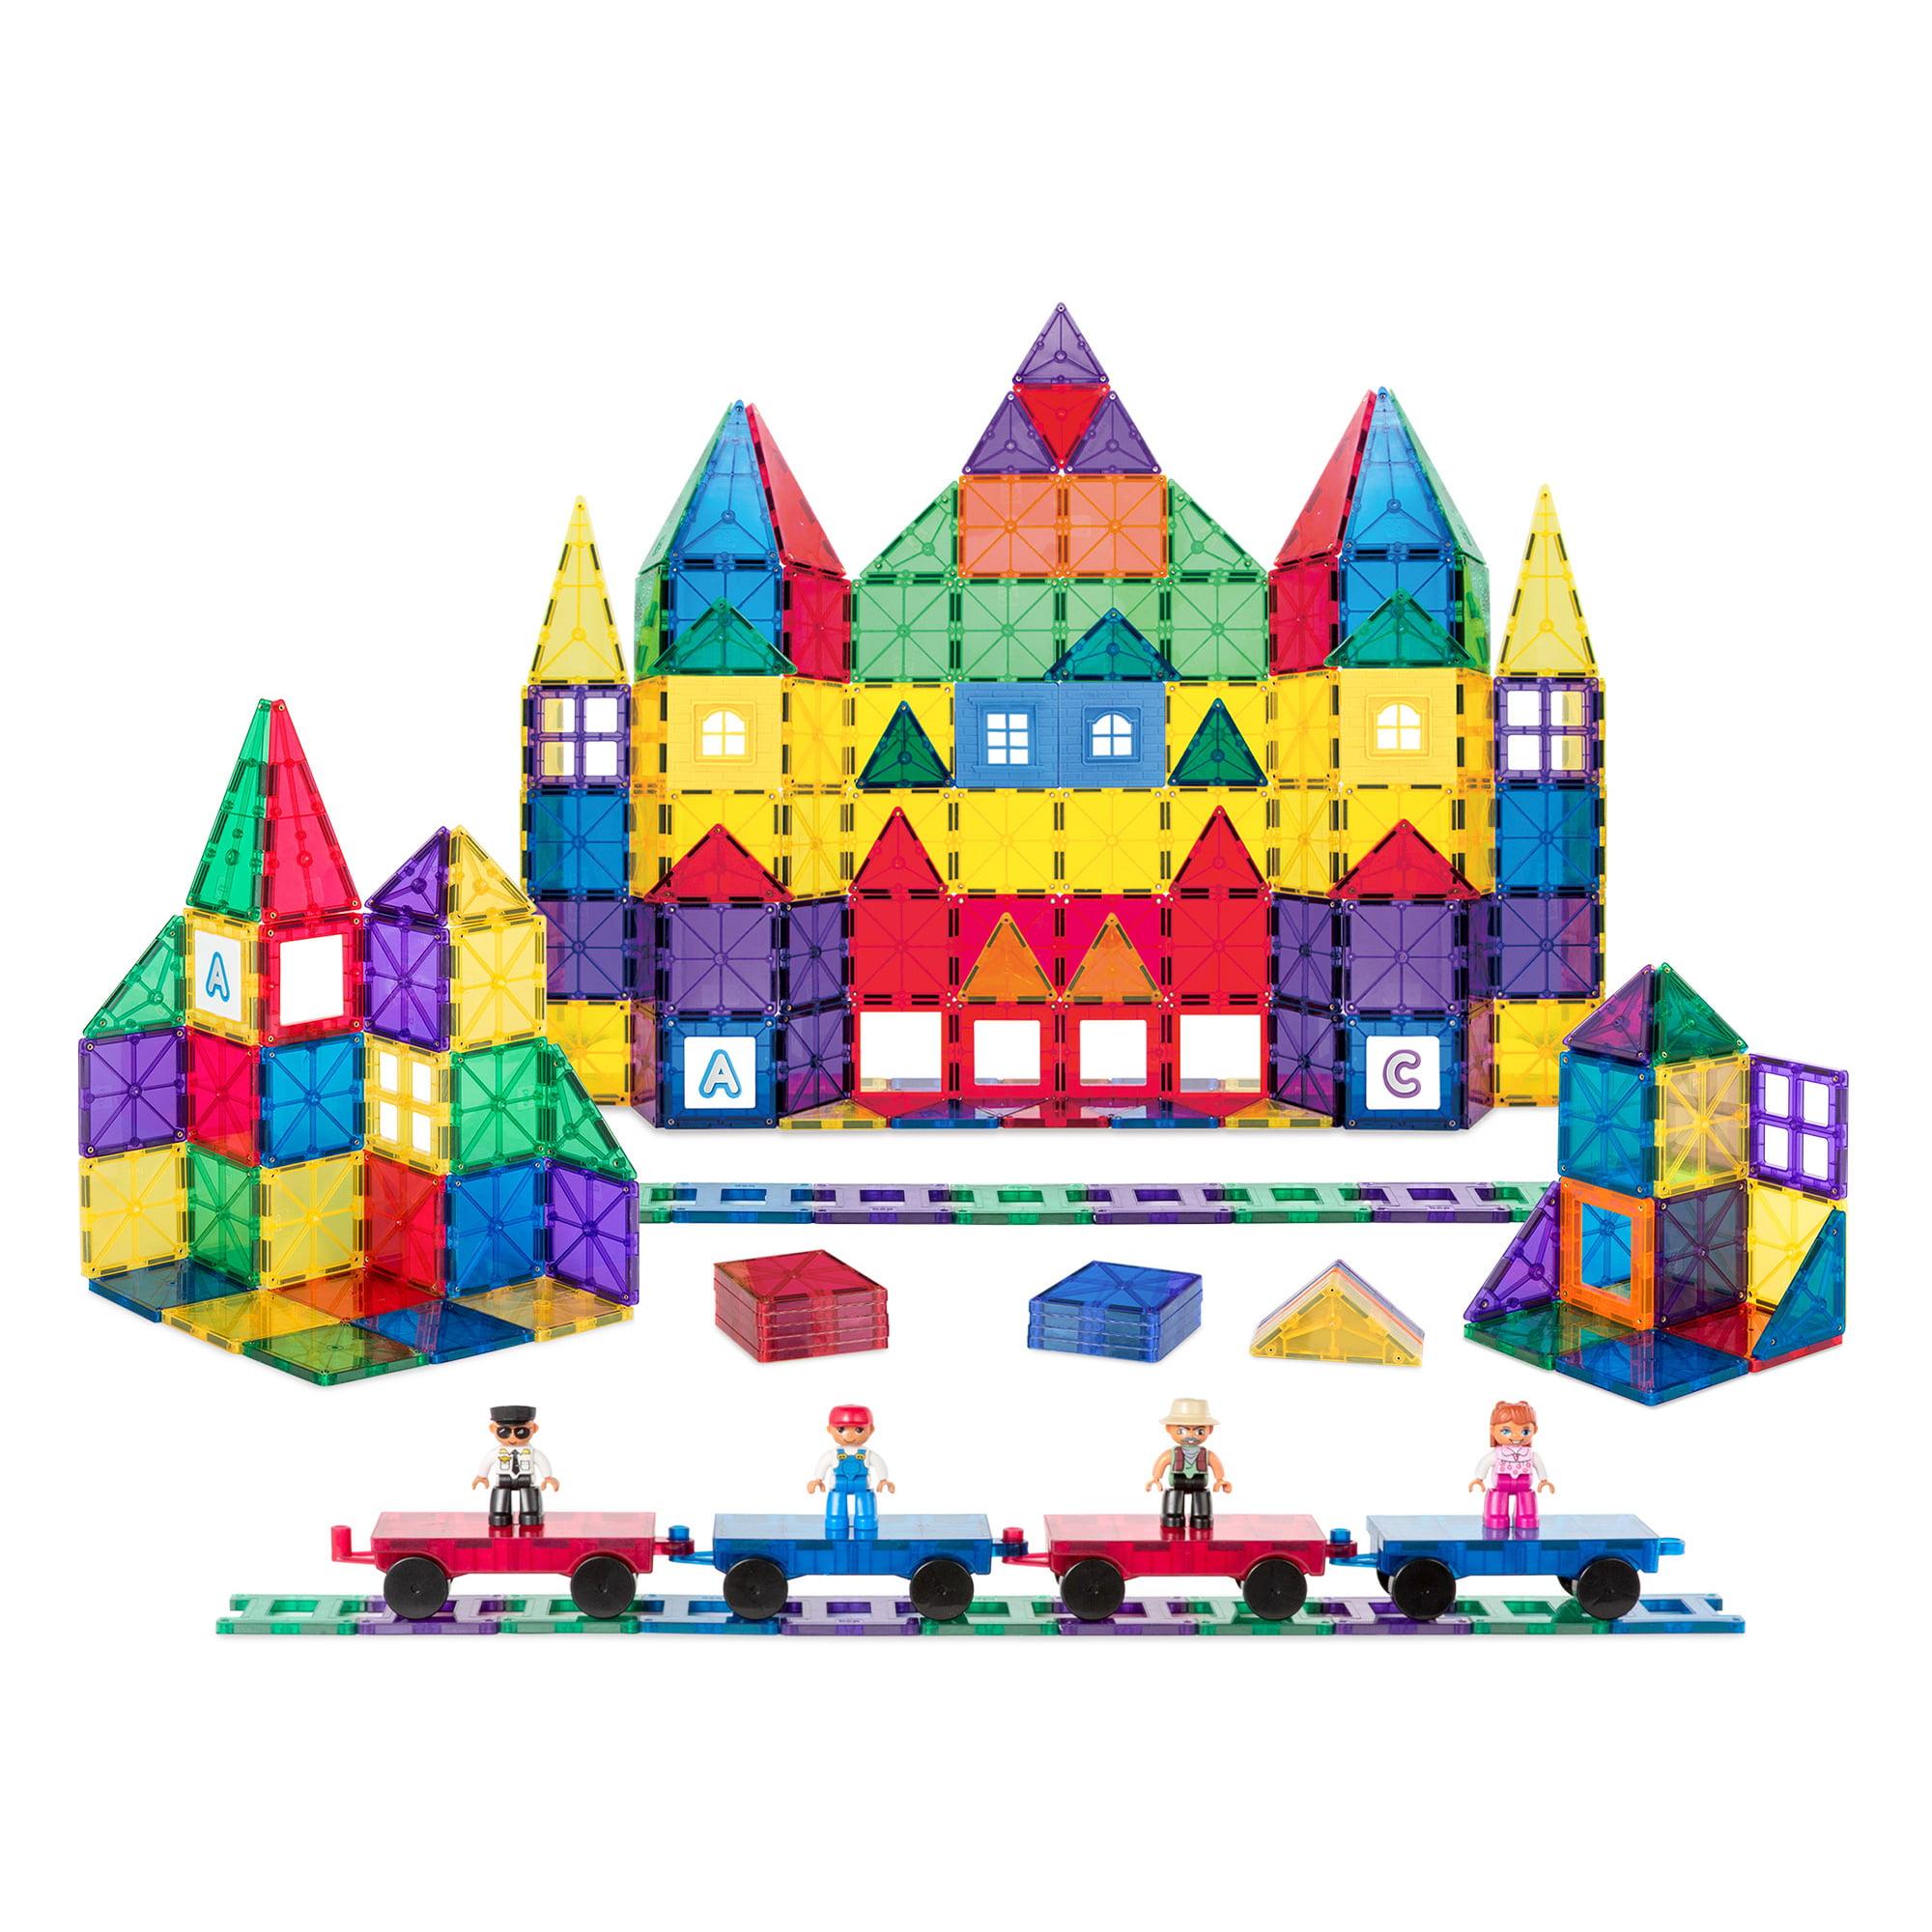 Best Choice Products 250-Piece Kids STEM 3D Magnetic Building Block Tile Toy Play Set w/ 4 Figures, Railroad Accessories - Walmart.com